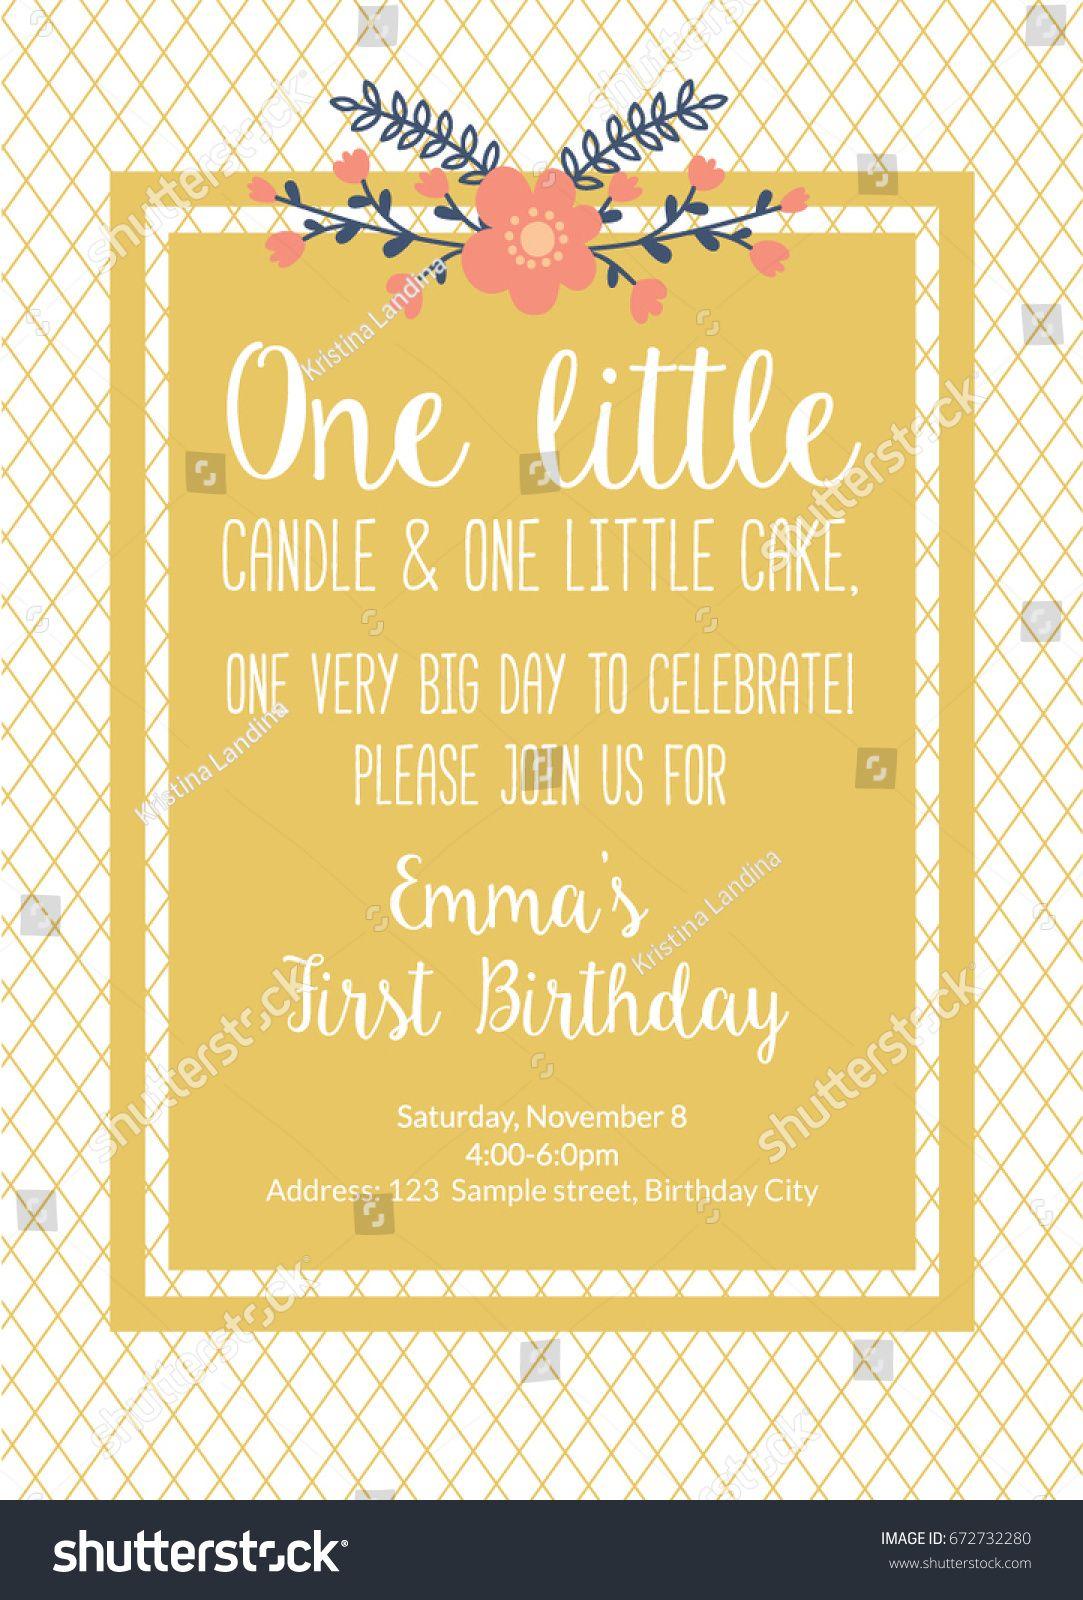 First Birthday Invitation Girl First Birthday Stock Vector Ideas 2019 Invitation Card Birthday First Birthday Invitations Birthday Invitations Girl